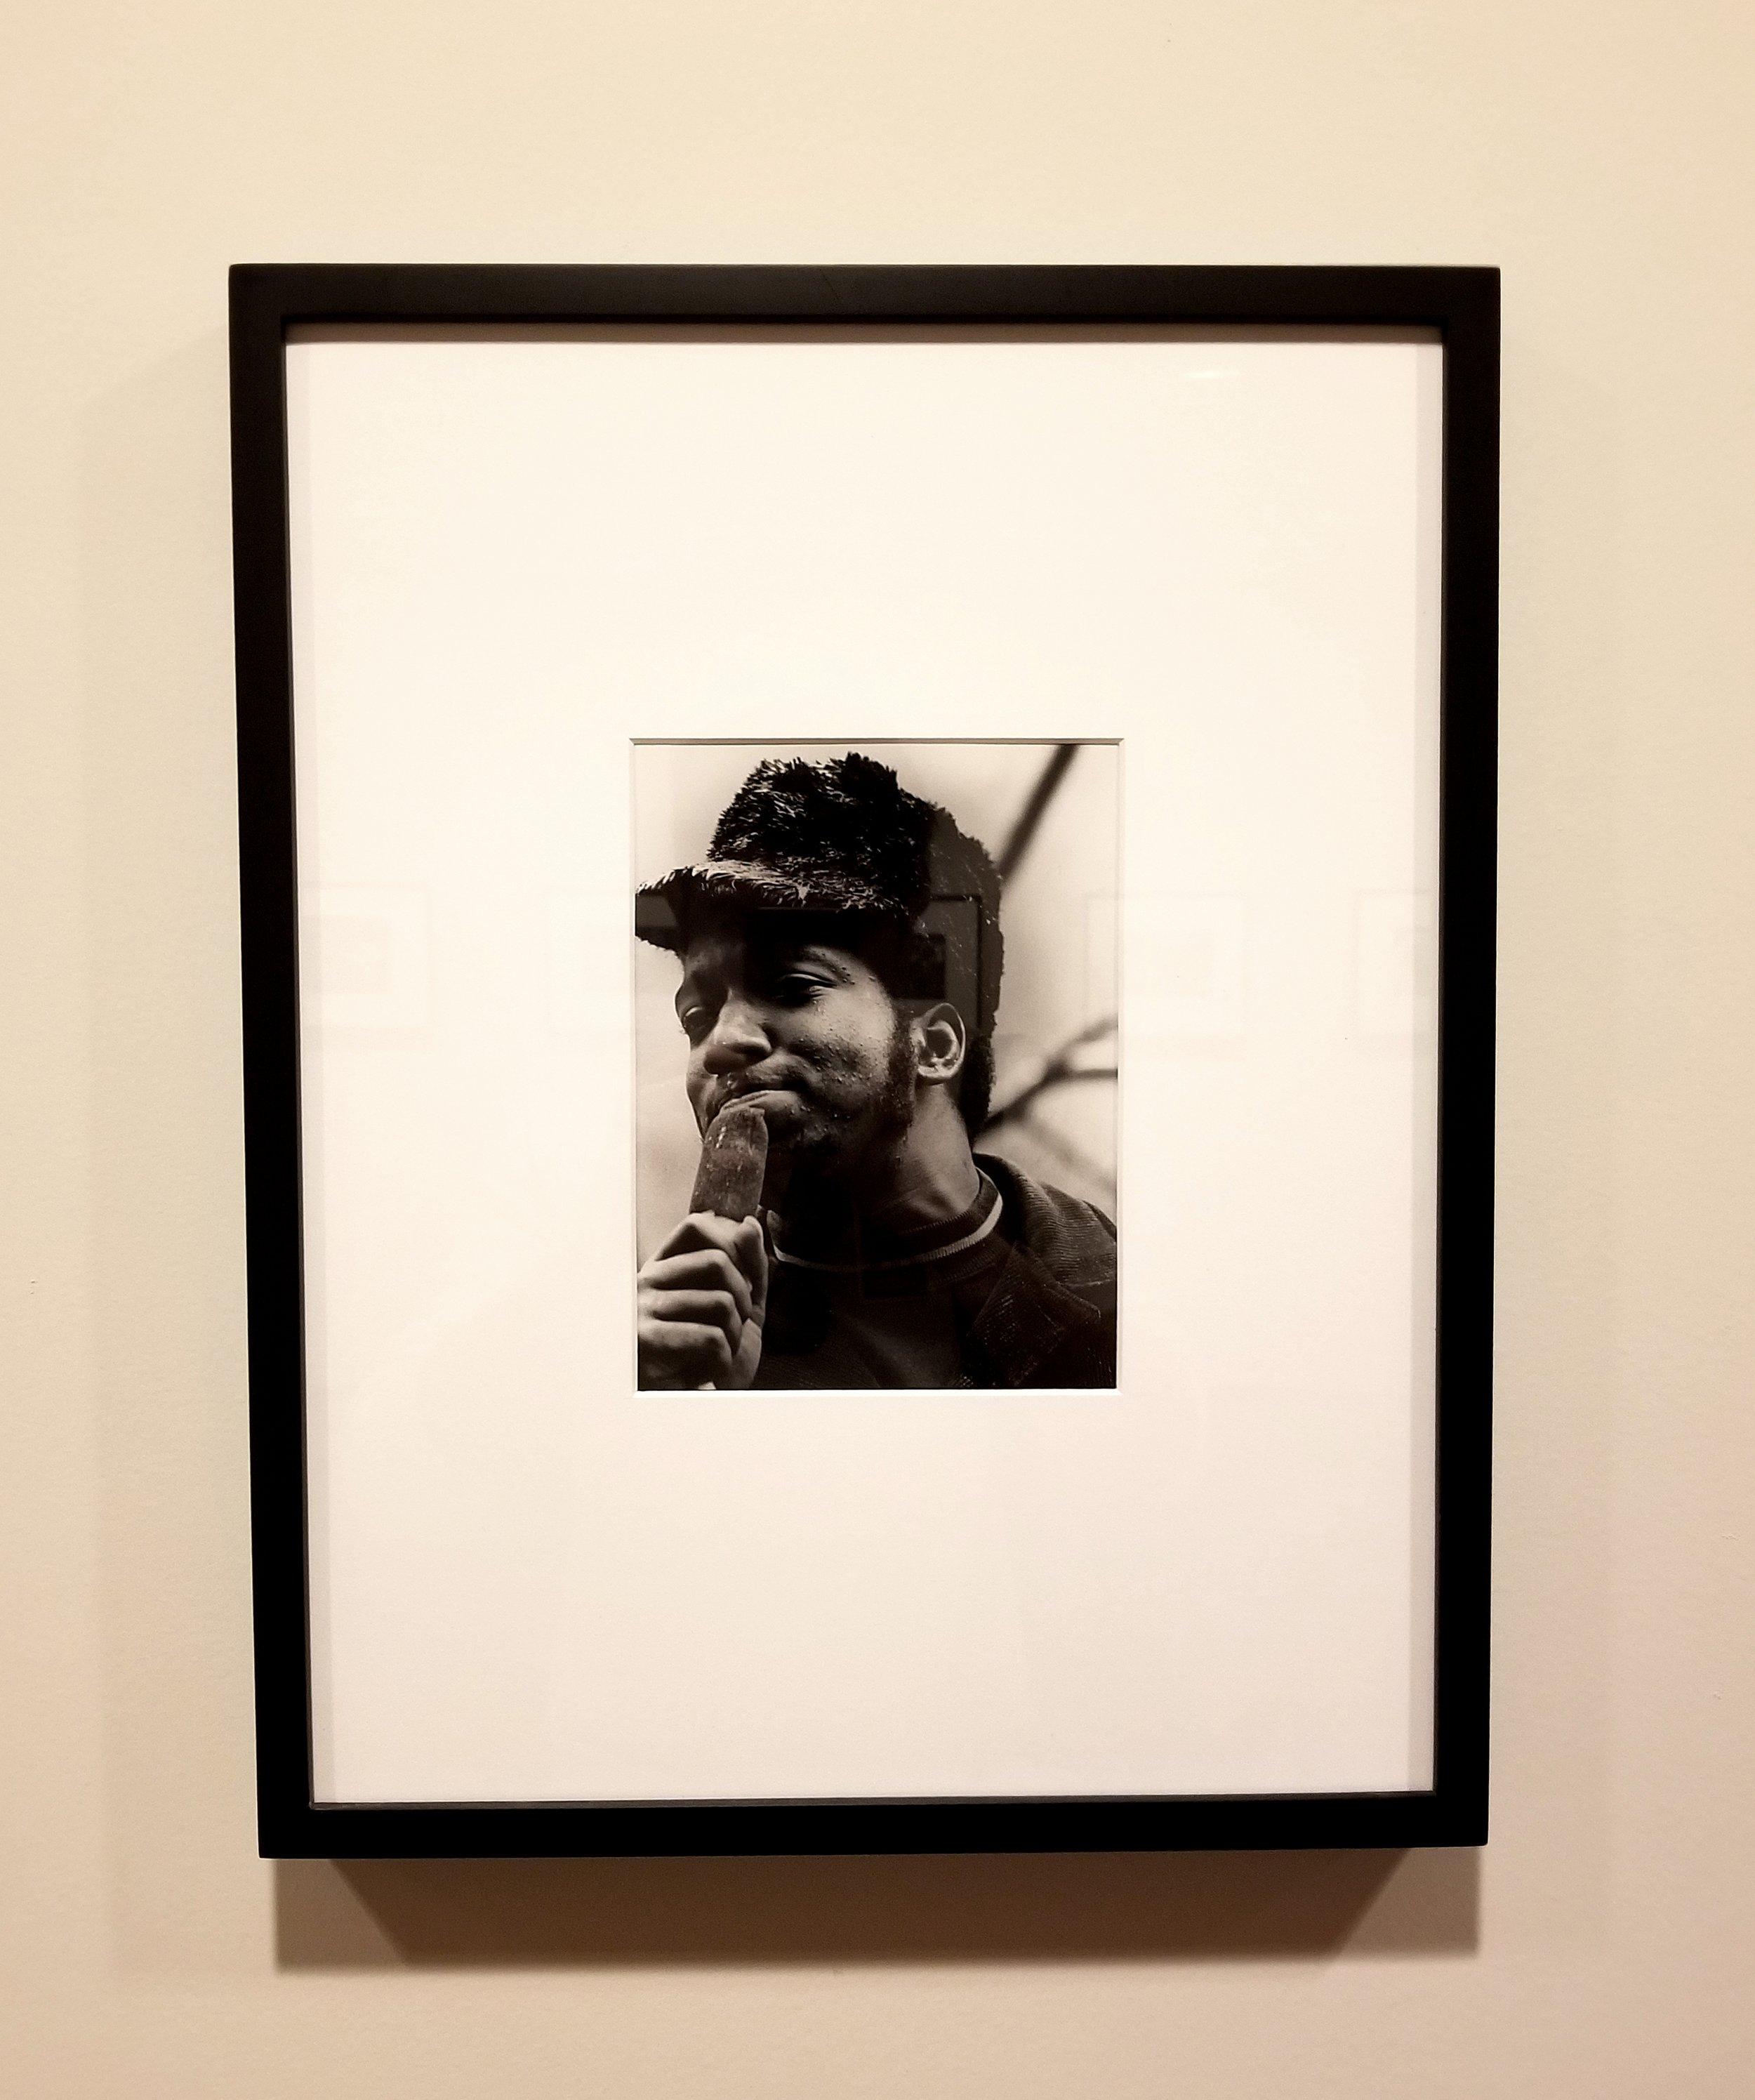 Bob Crawford, Untitled (Fred Hampton) 1960/69